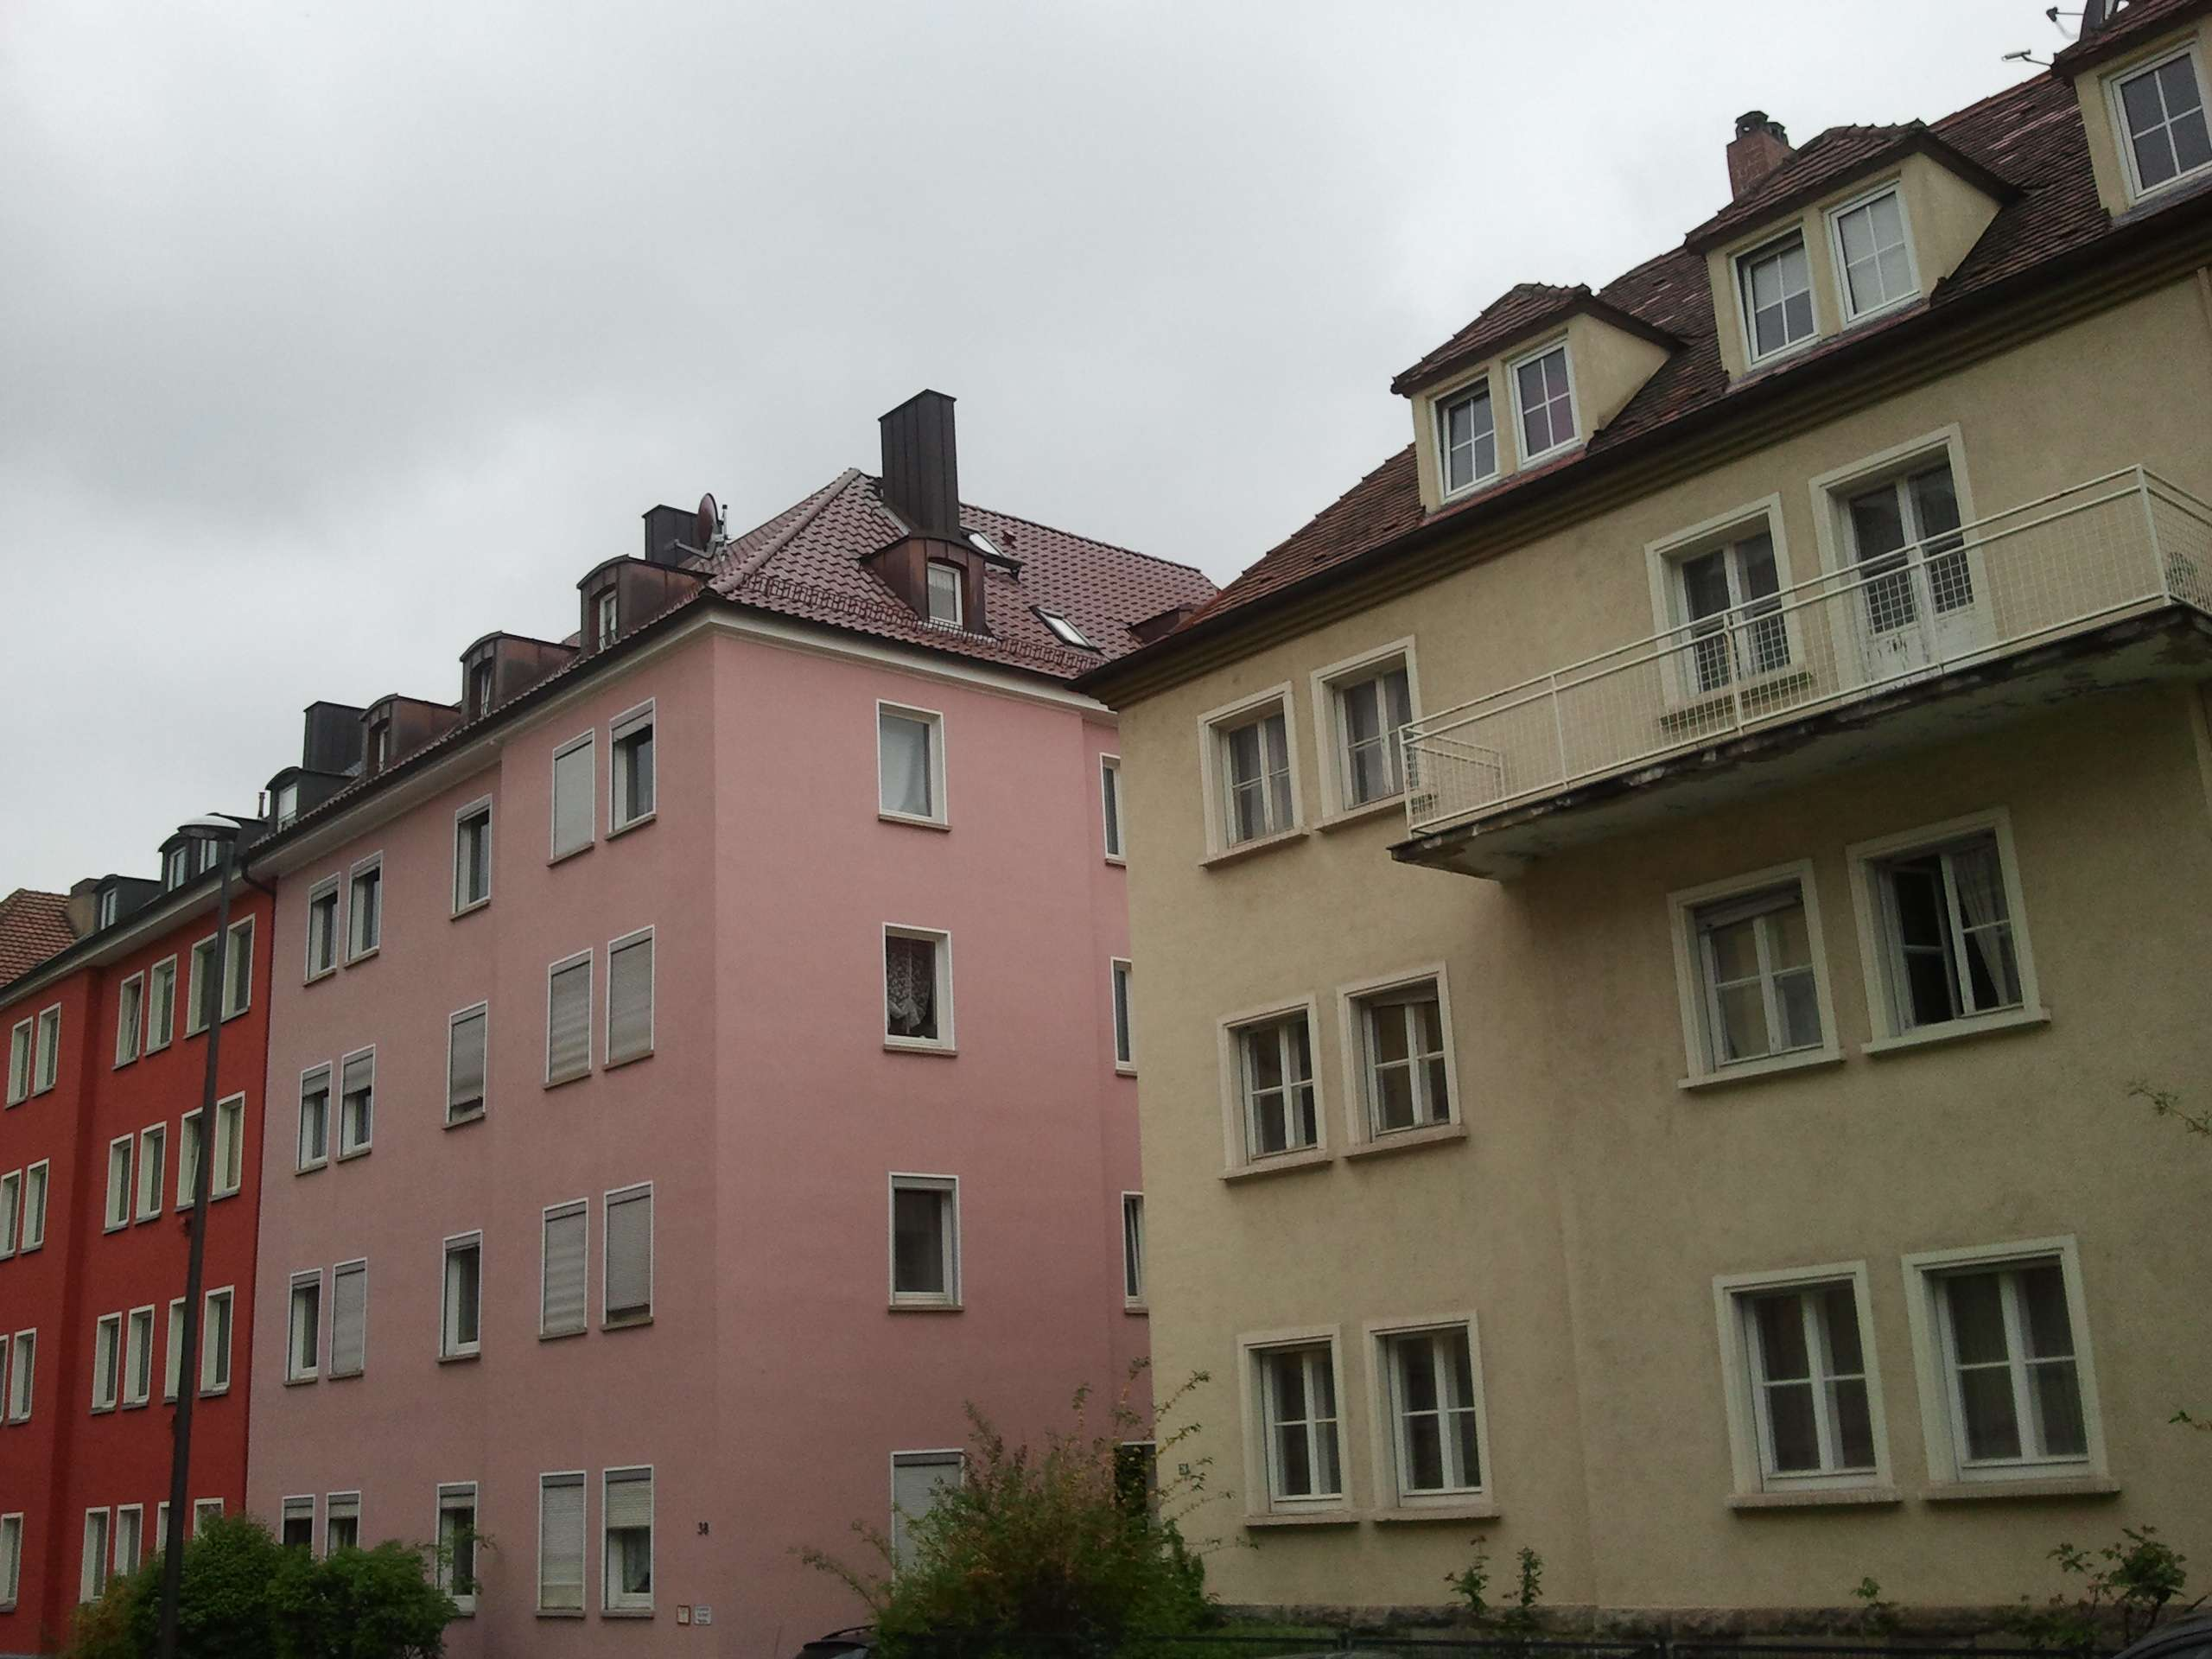 Ruhig gelegene Dachgeschosswohnung in